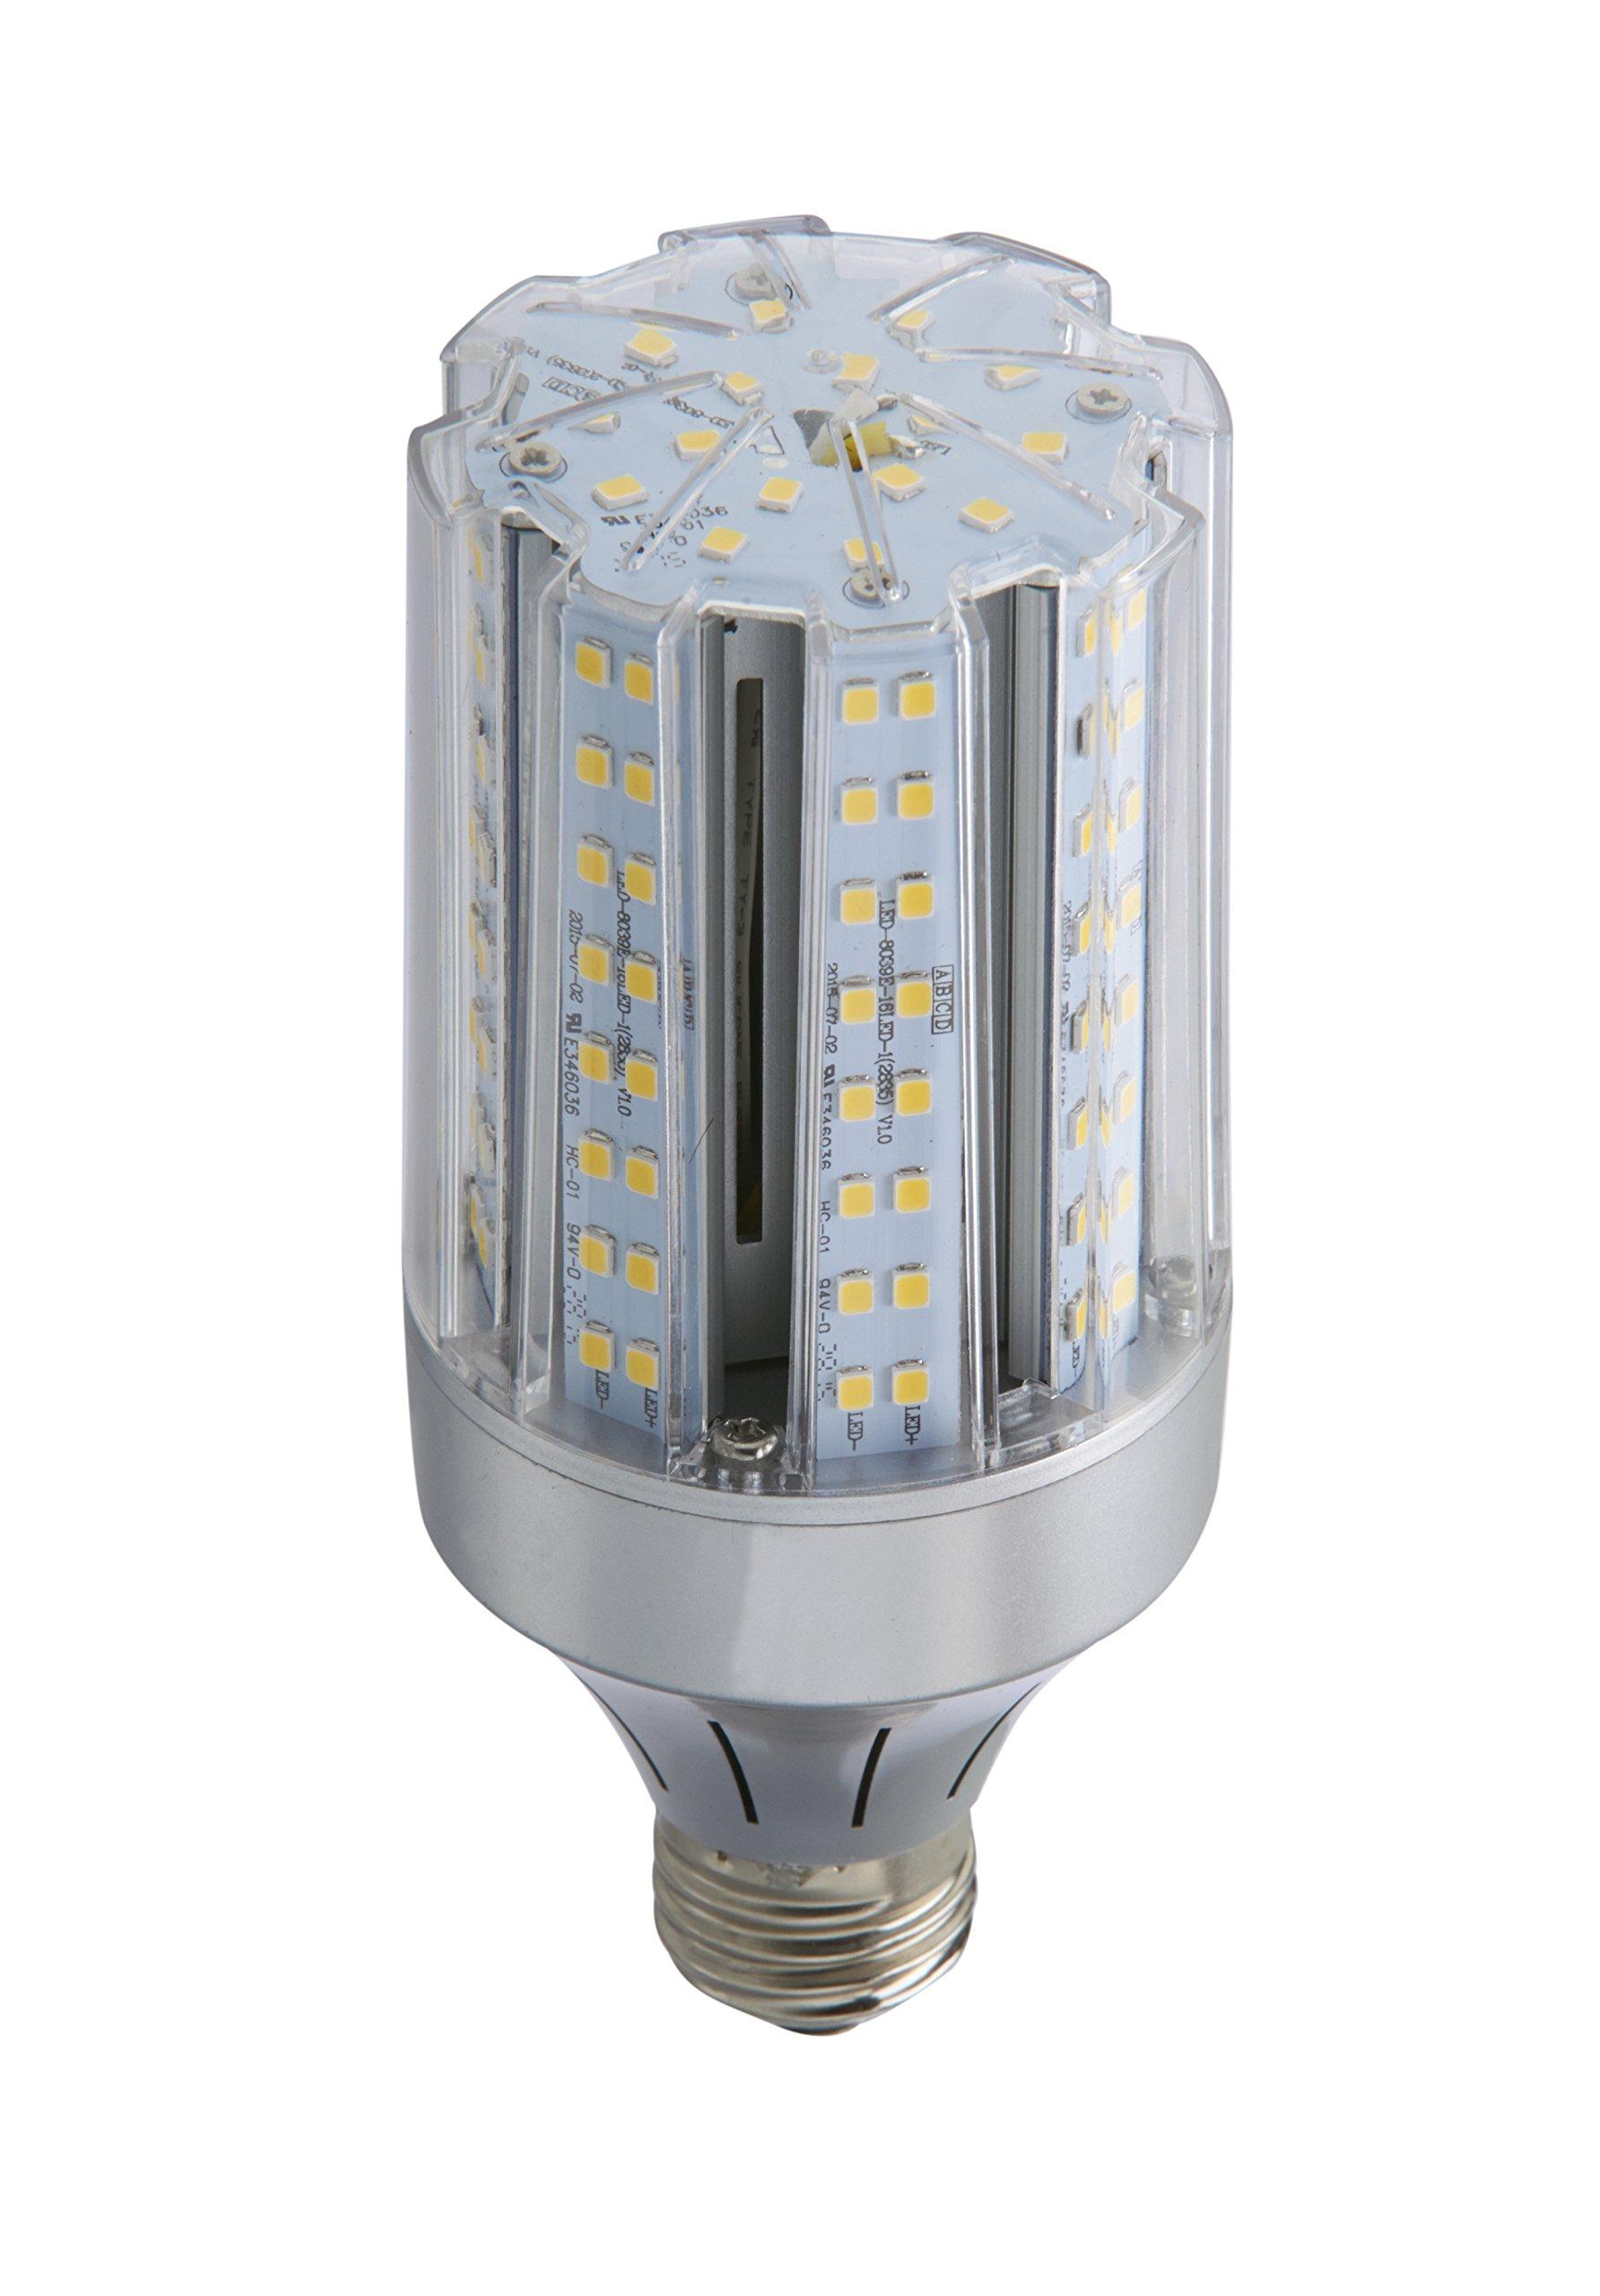 Light Efficient Design LED-8039E42K HID LED Retrofit Lighting 18-watt UL Rated Light Bulb